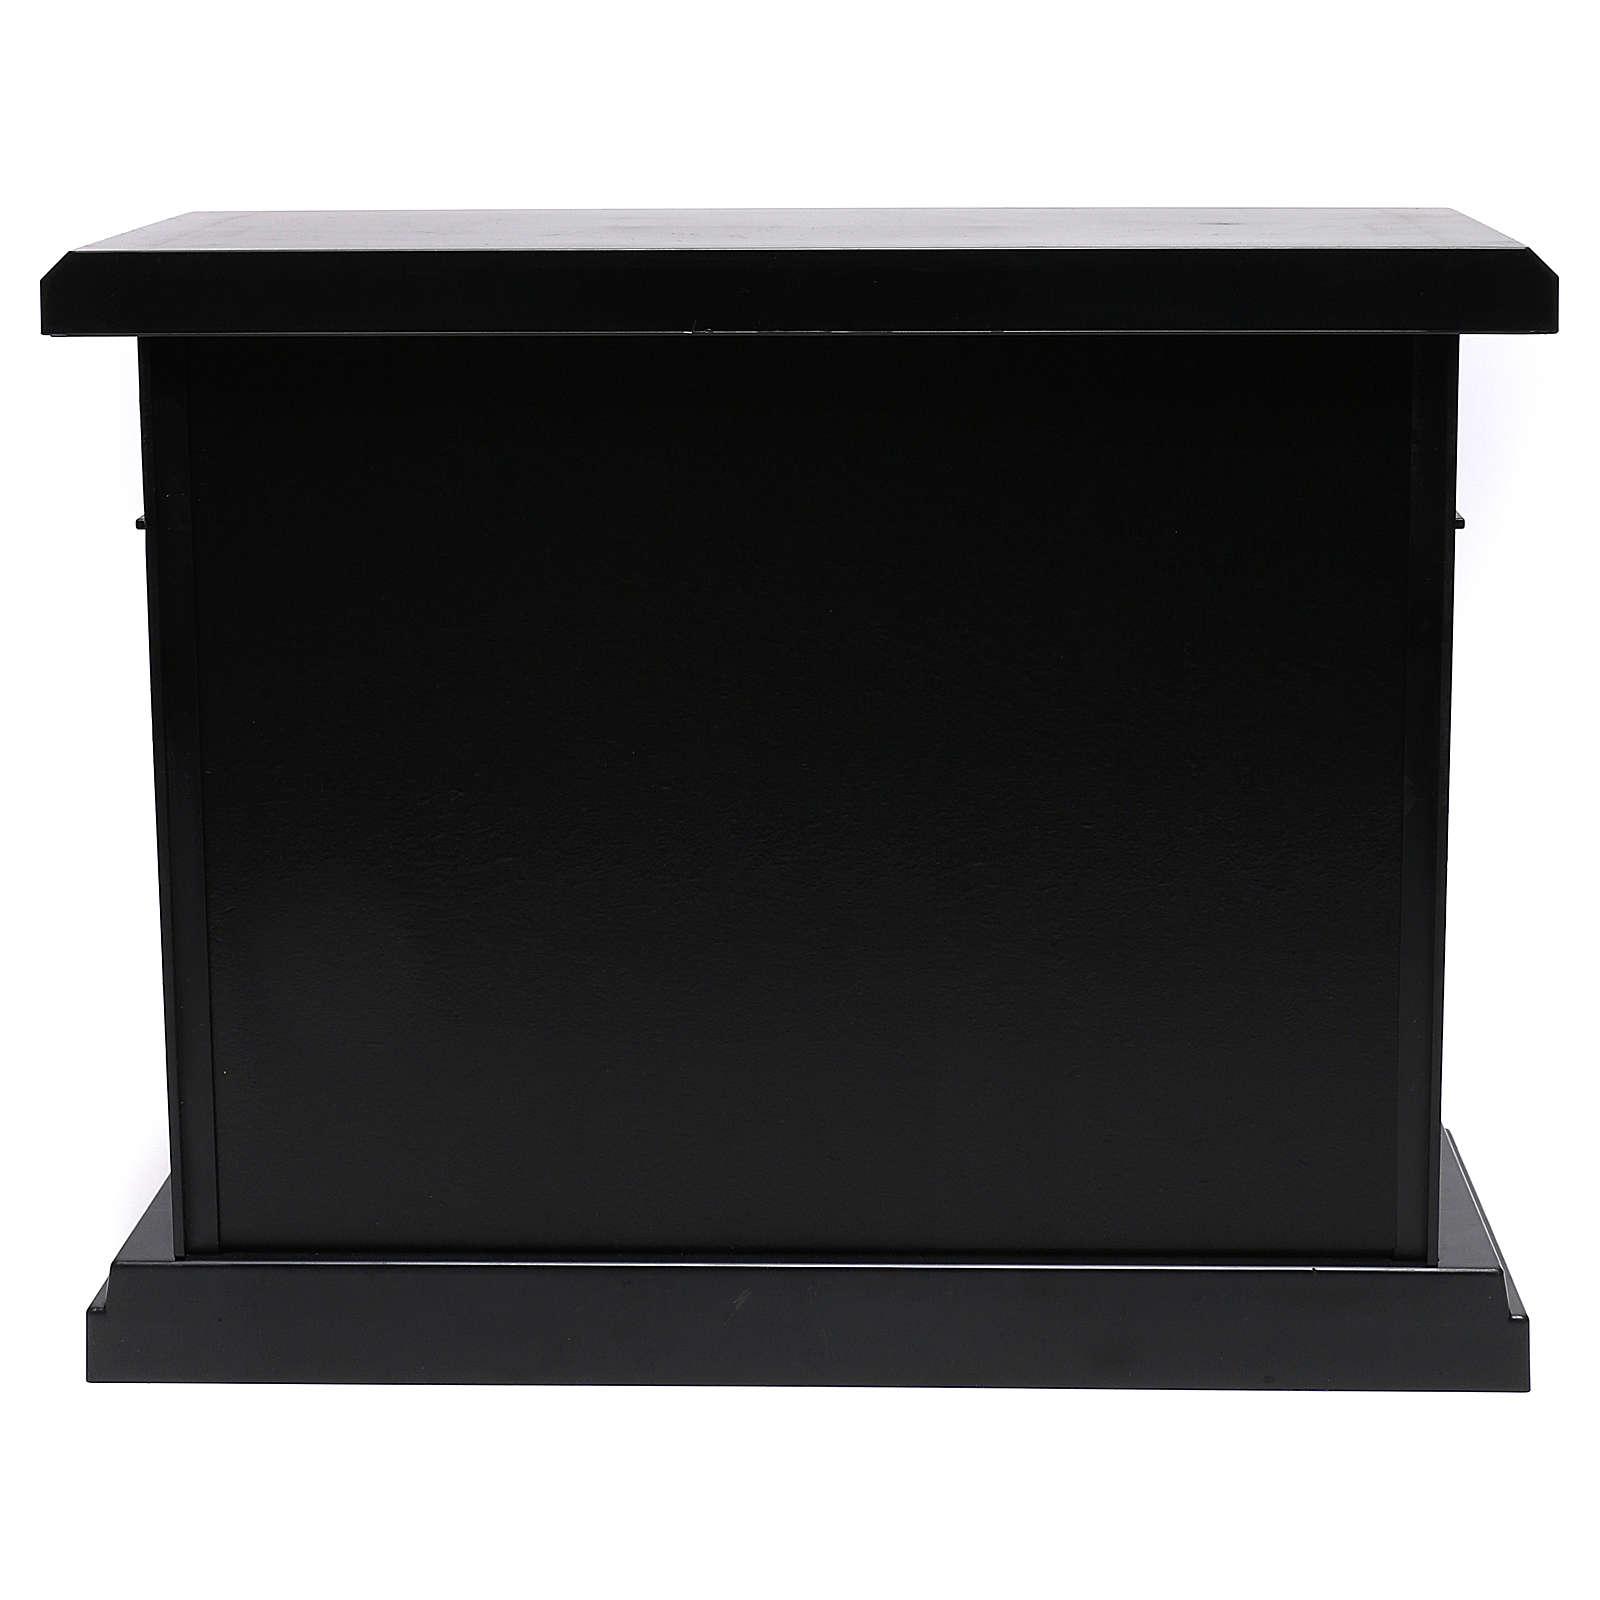 Chimenea negra led 35x40x15 cm efecto llama 3